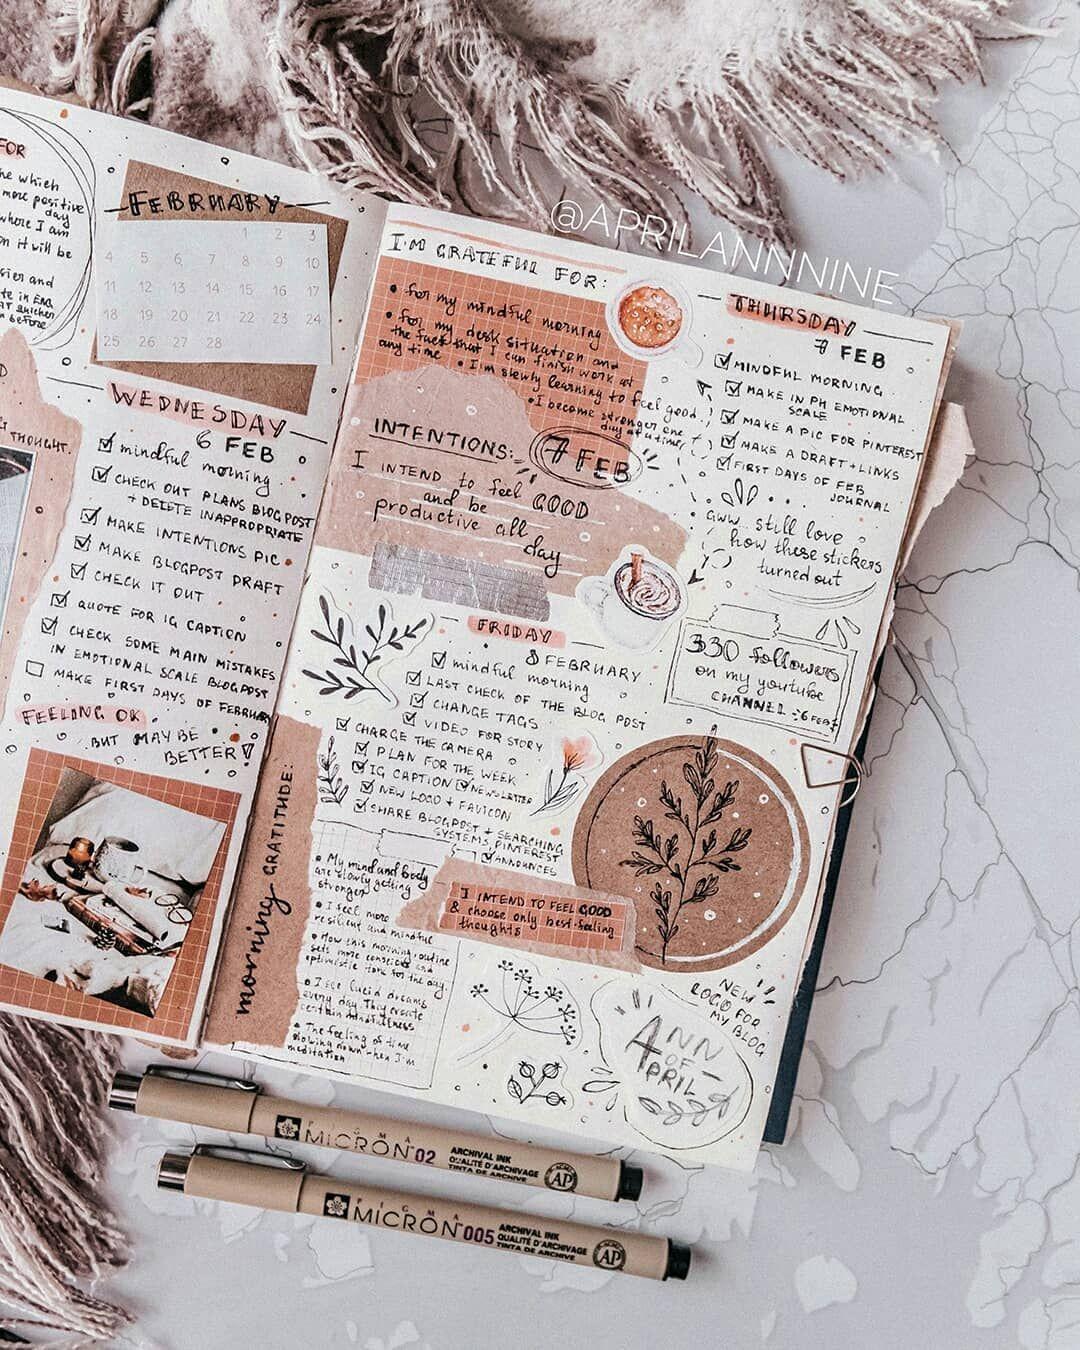 Ann Former Aprilannnine On Instagram Learning To Appreciate And Celebrate Little M Bullet Journal Ideas Pages Bullet Journal Inspiration Bullet Journal Art